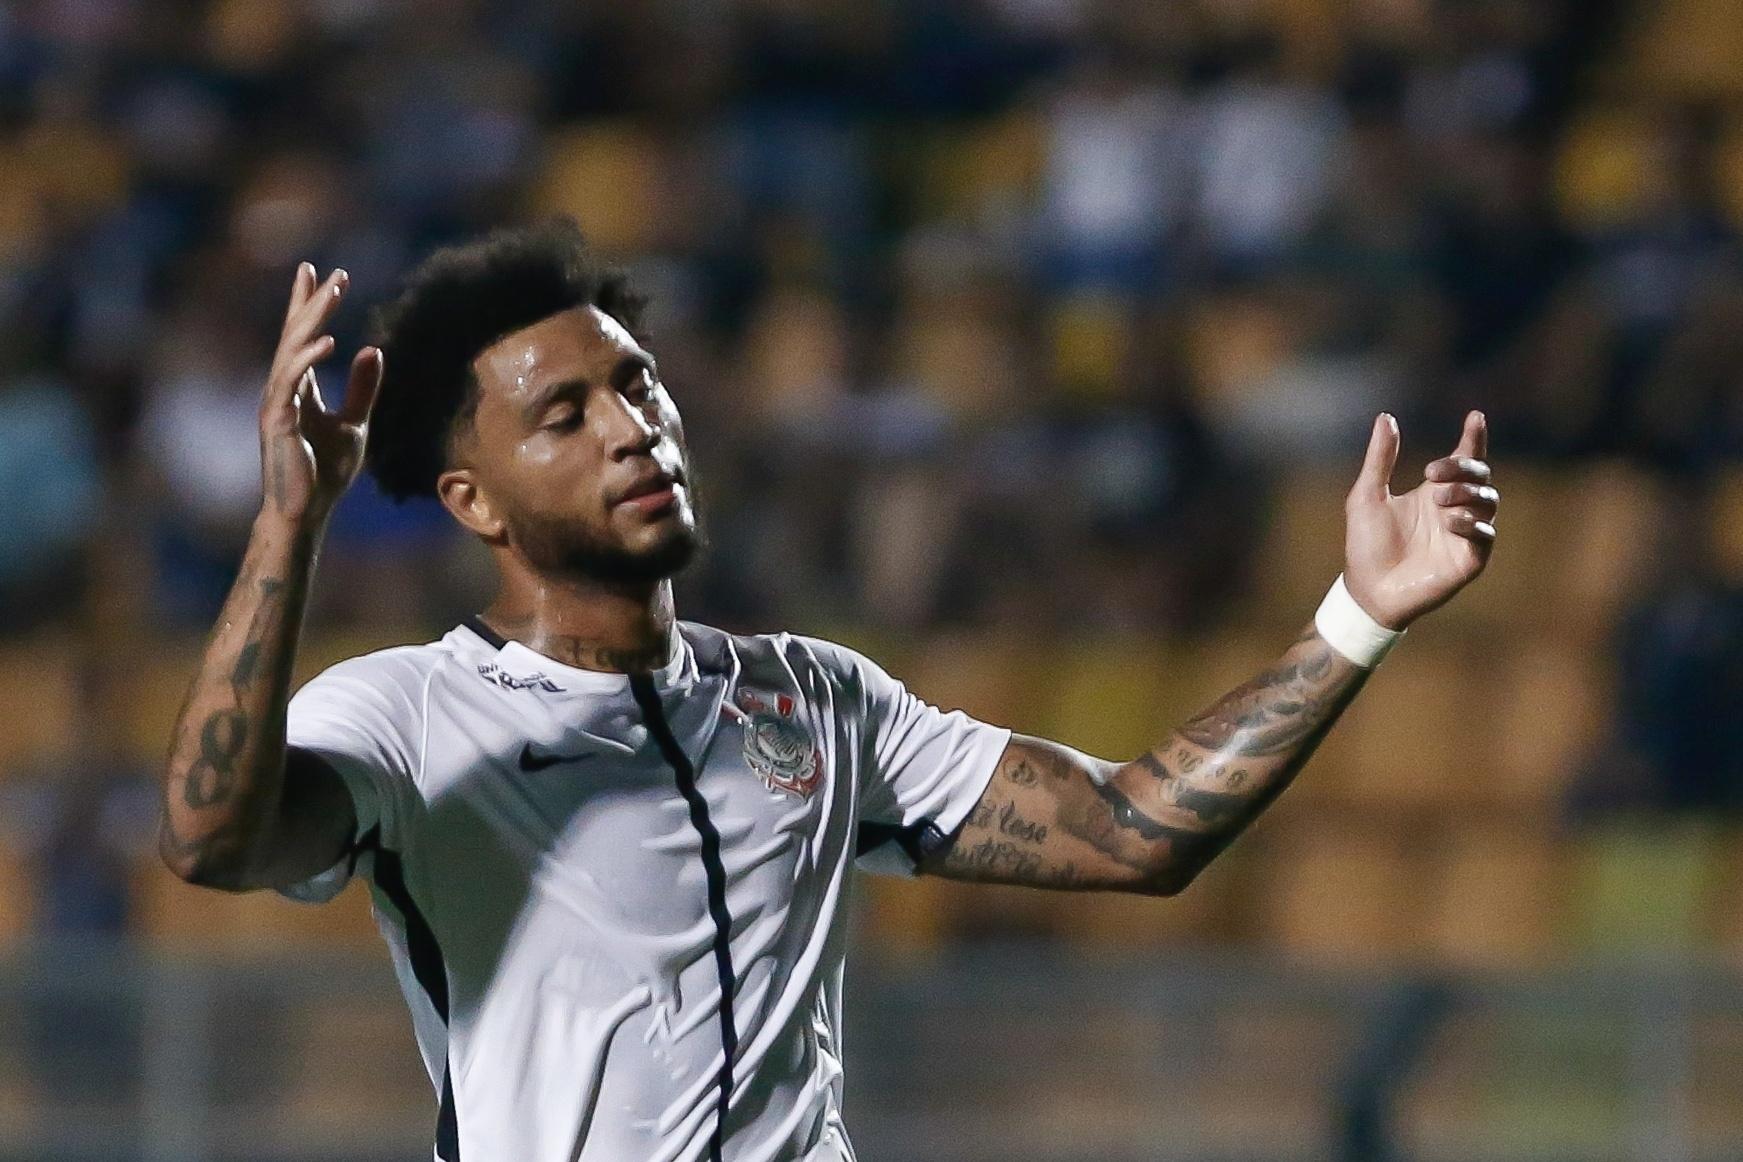 Kazim lamenta chance perdida pelo Corinthians contra a Ponte Preta